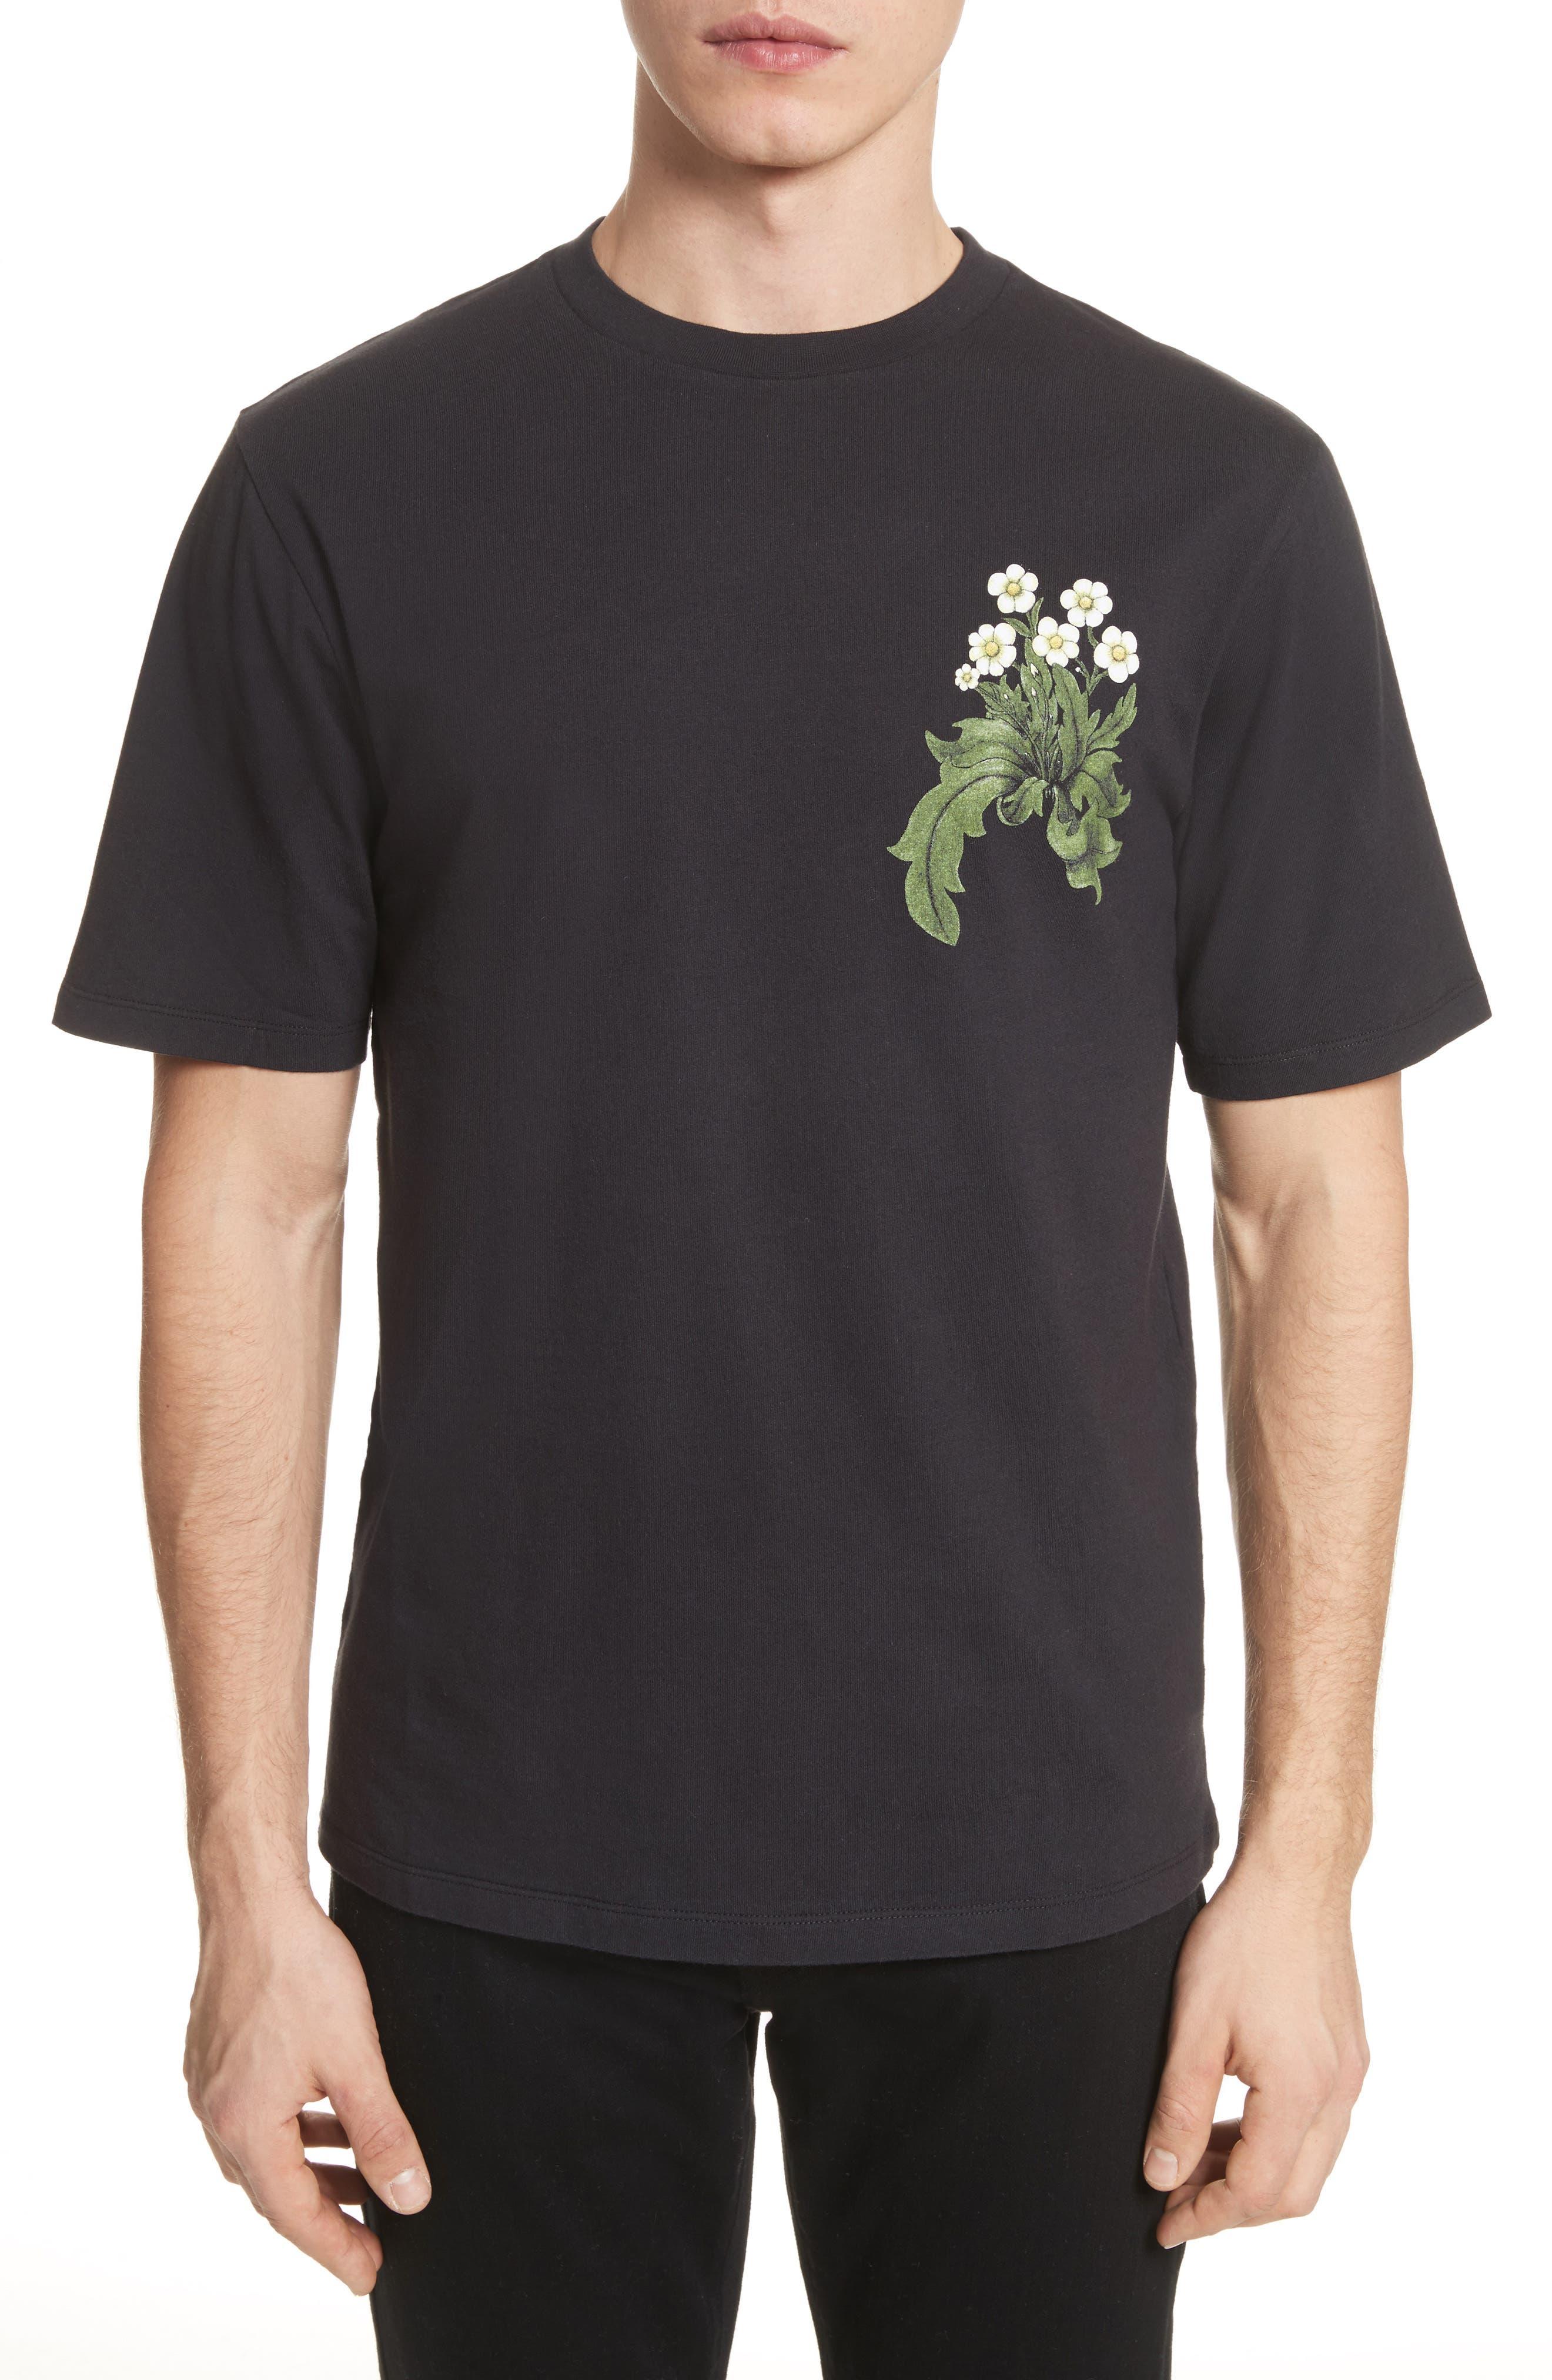 Loewe & Co. Graphic T-Shirt,                             Main thumbnail 1, color,                             001